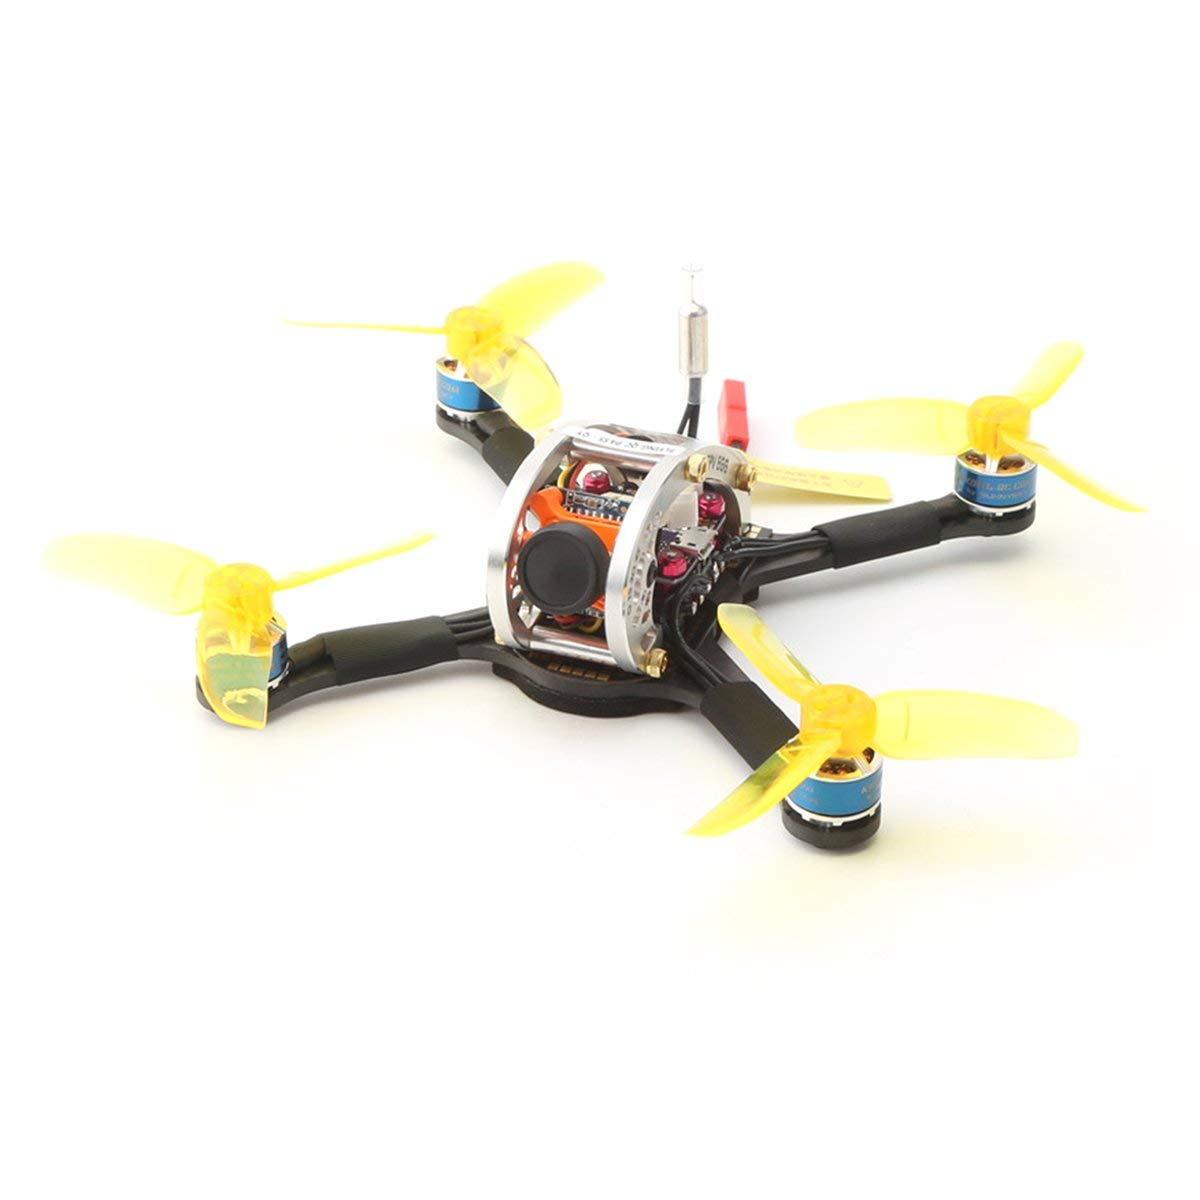 Gugutogo Drohne mit Kamera LDARC FPVEGG V2 5.8G Brushless-OSD-Kamera Mini FPV RC Racing Drohne PNP-Version